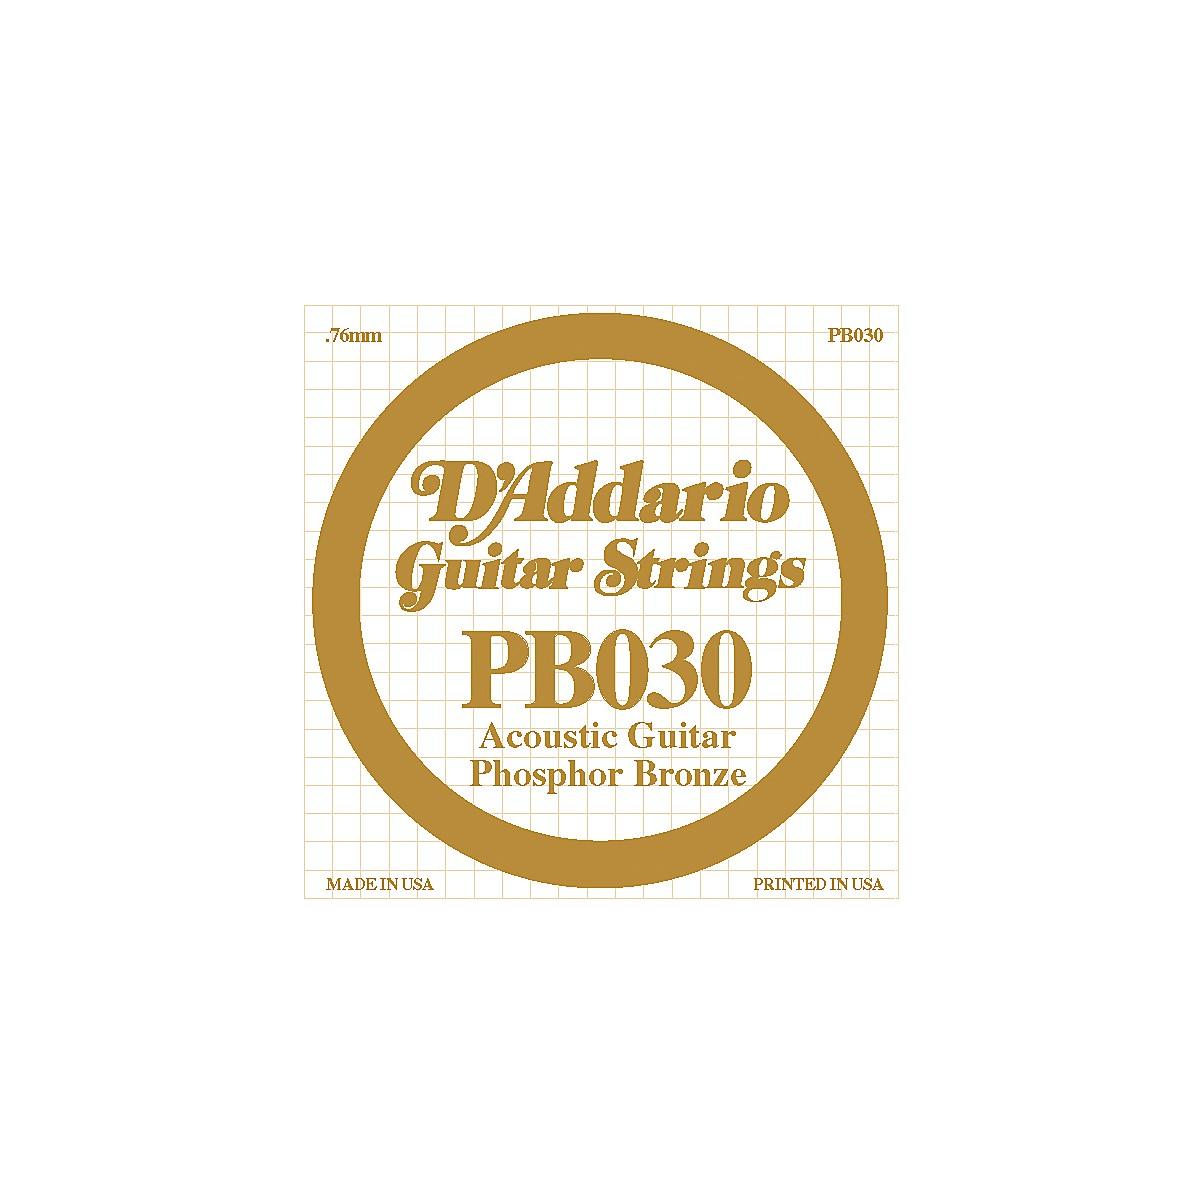 D'Addario PB030 Phosphor Bronze Acoustic Guitar Strings